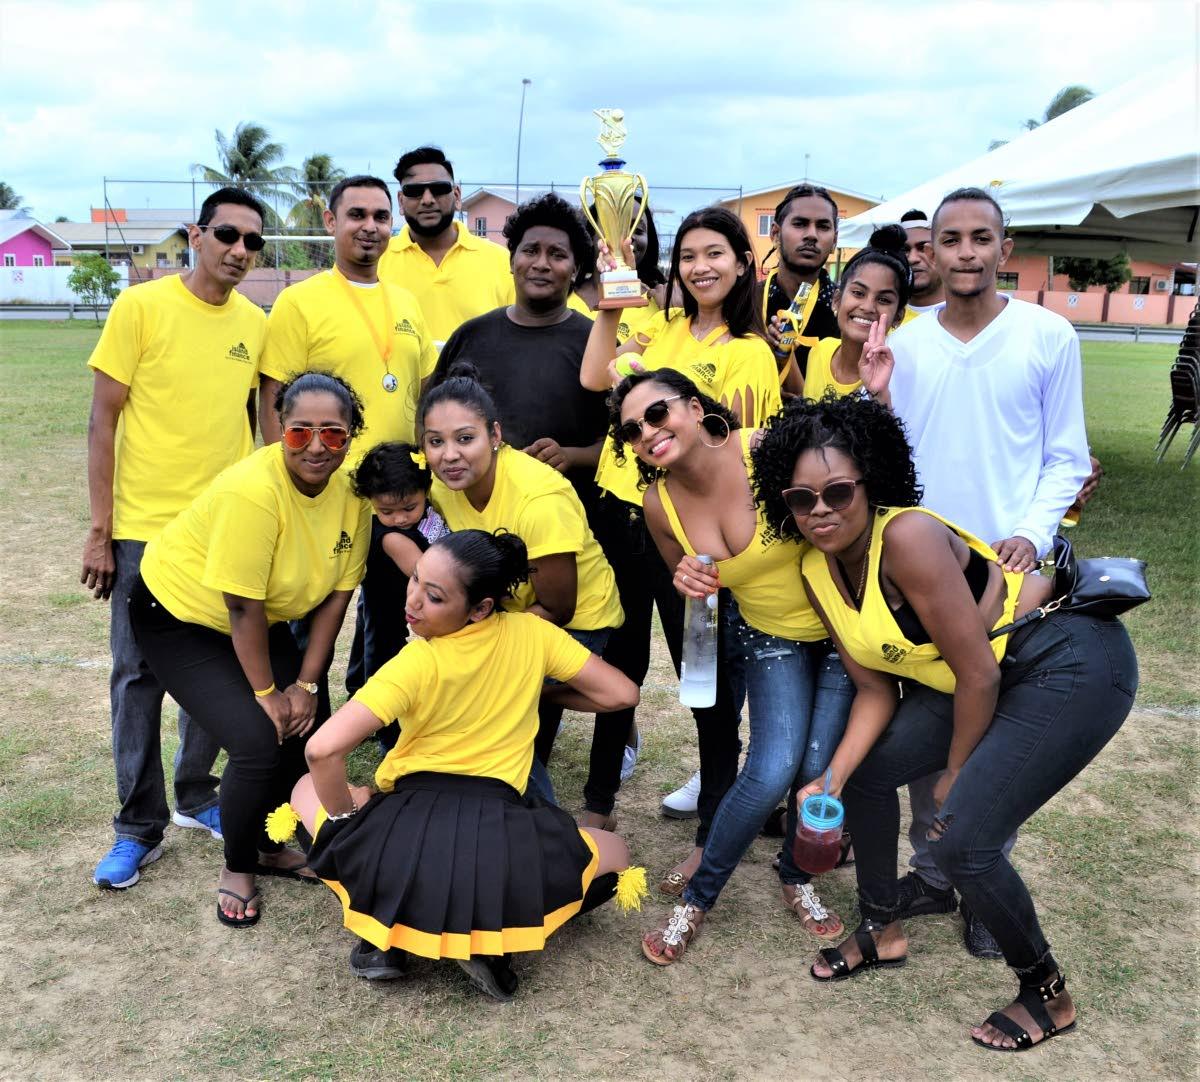 Island Finance Trinidad Head Office